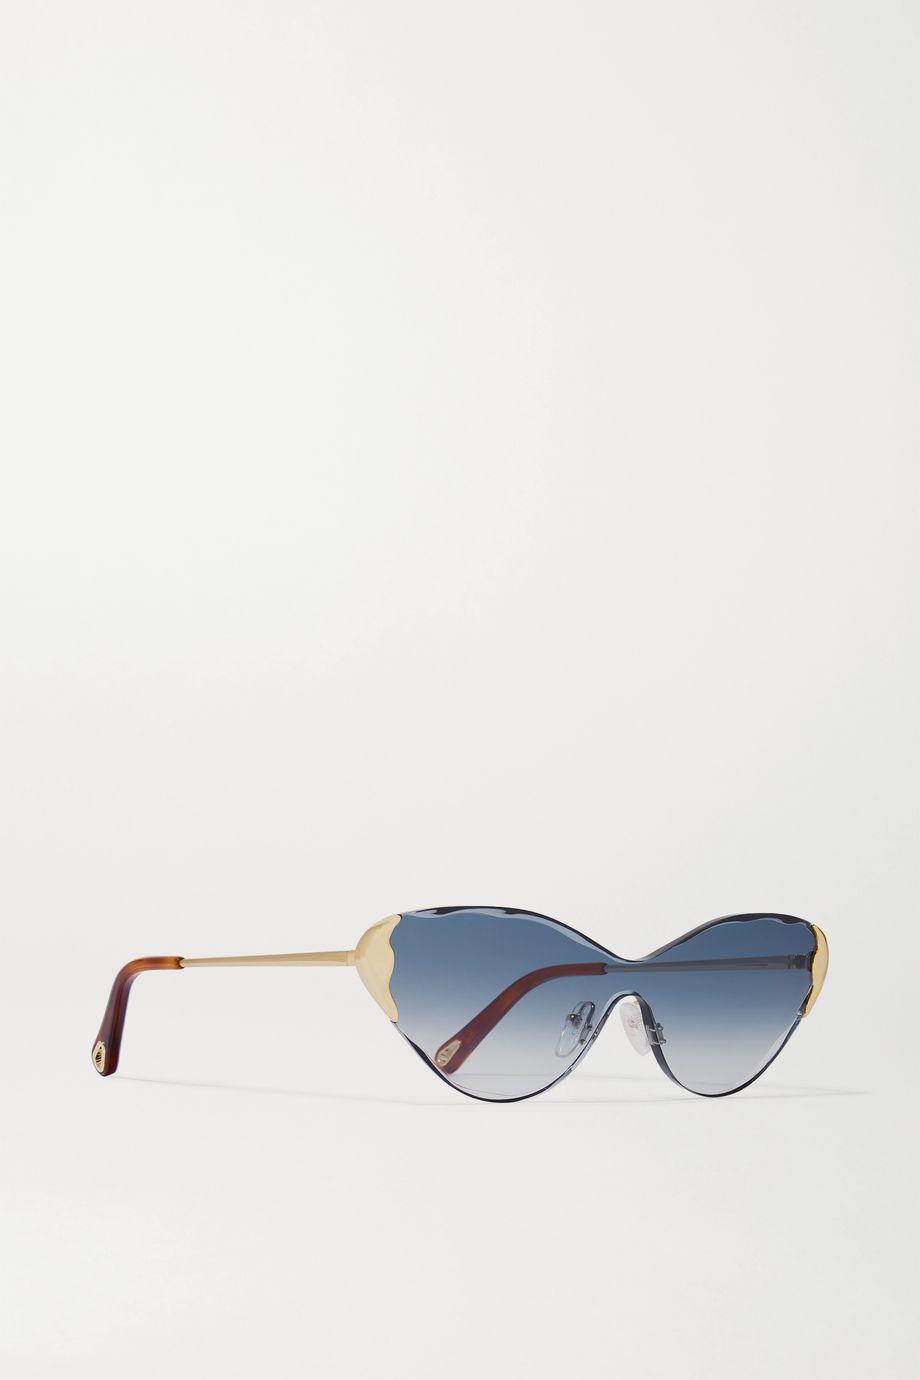 Chloé Cat-eye gold-tone and tortoiseshell acetate sunglasses